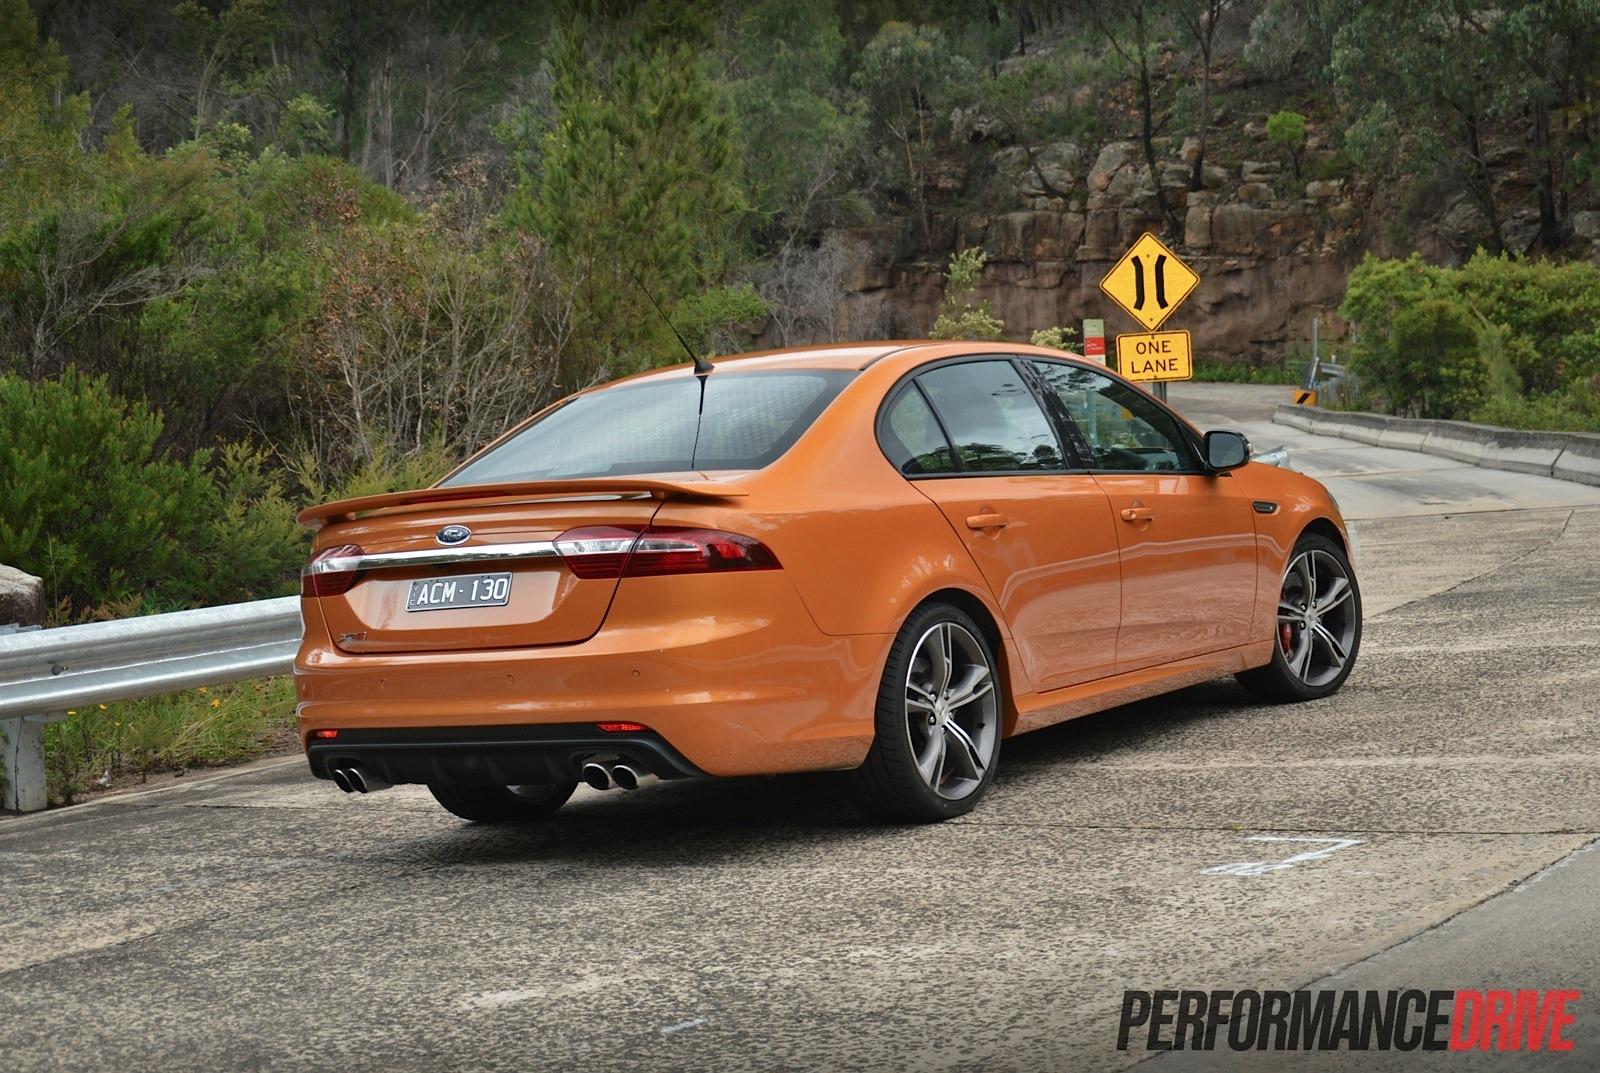 Ford Falcon XR8 FG X review (video) | PerformanceDrive